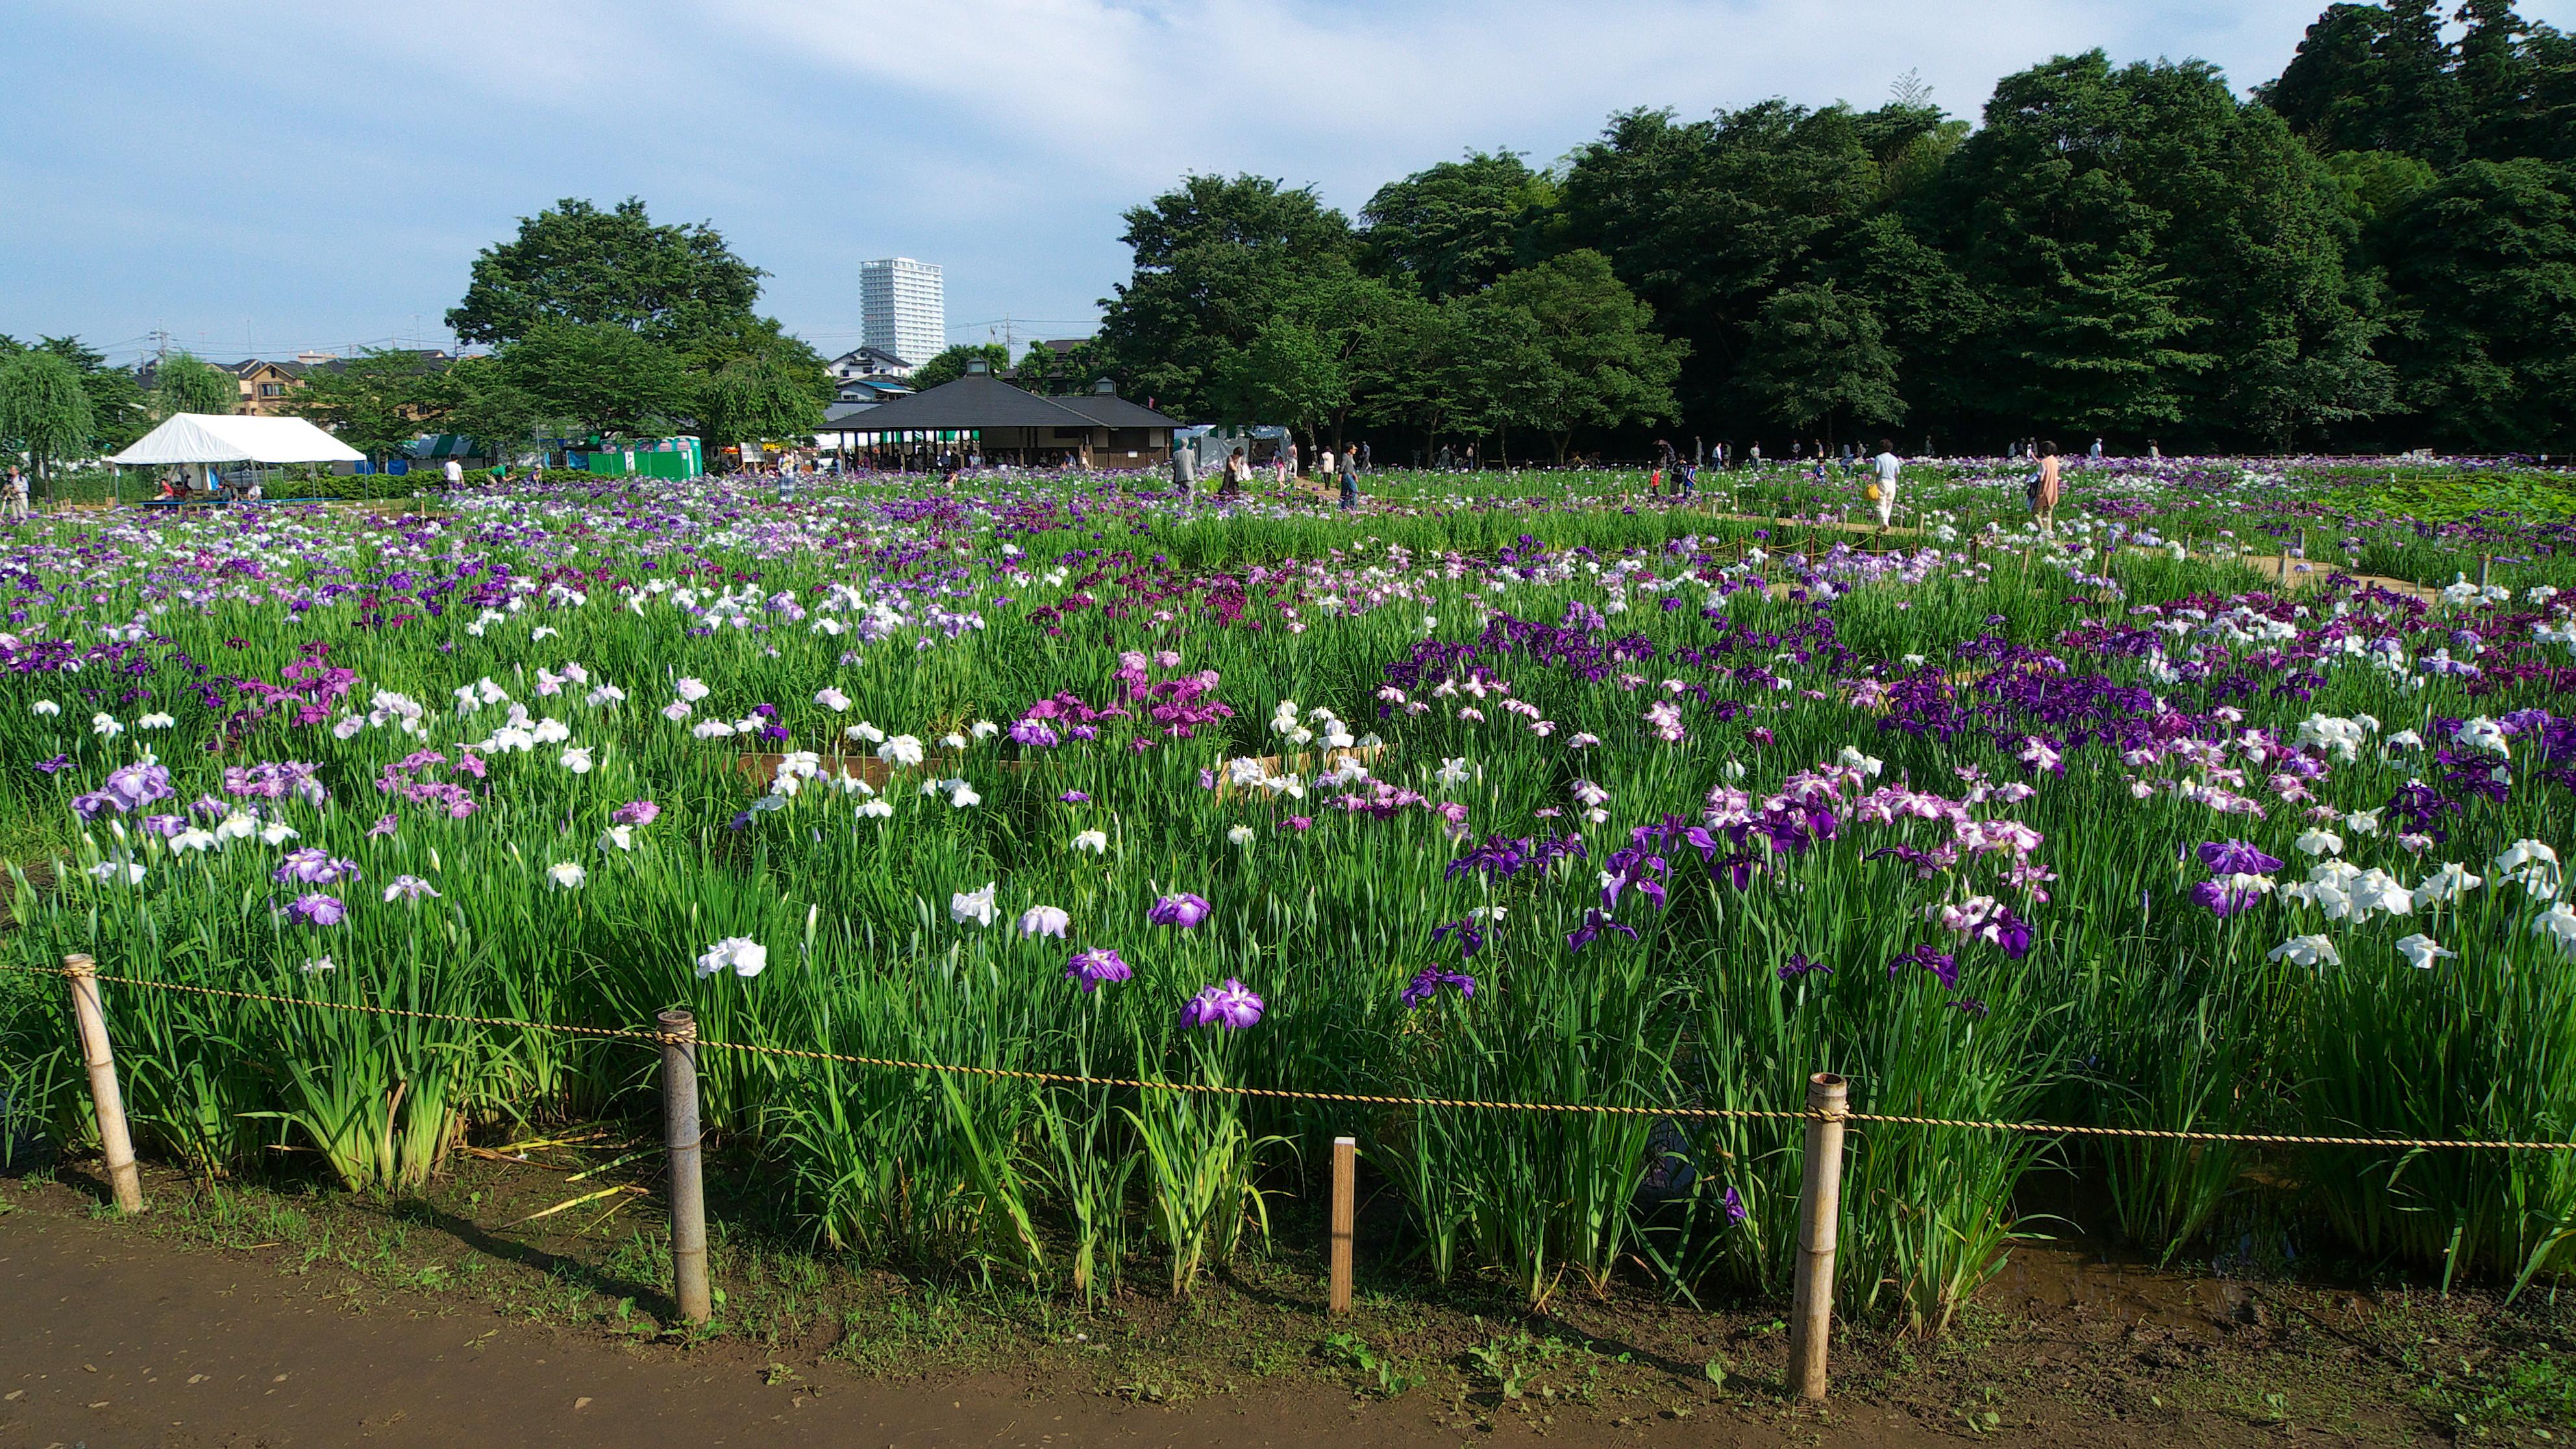 Exceptional File:Kitayama Park Iris Garden